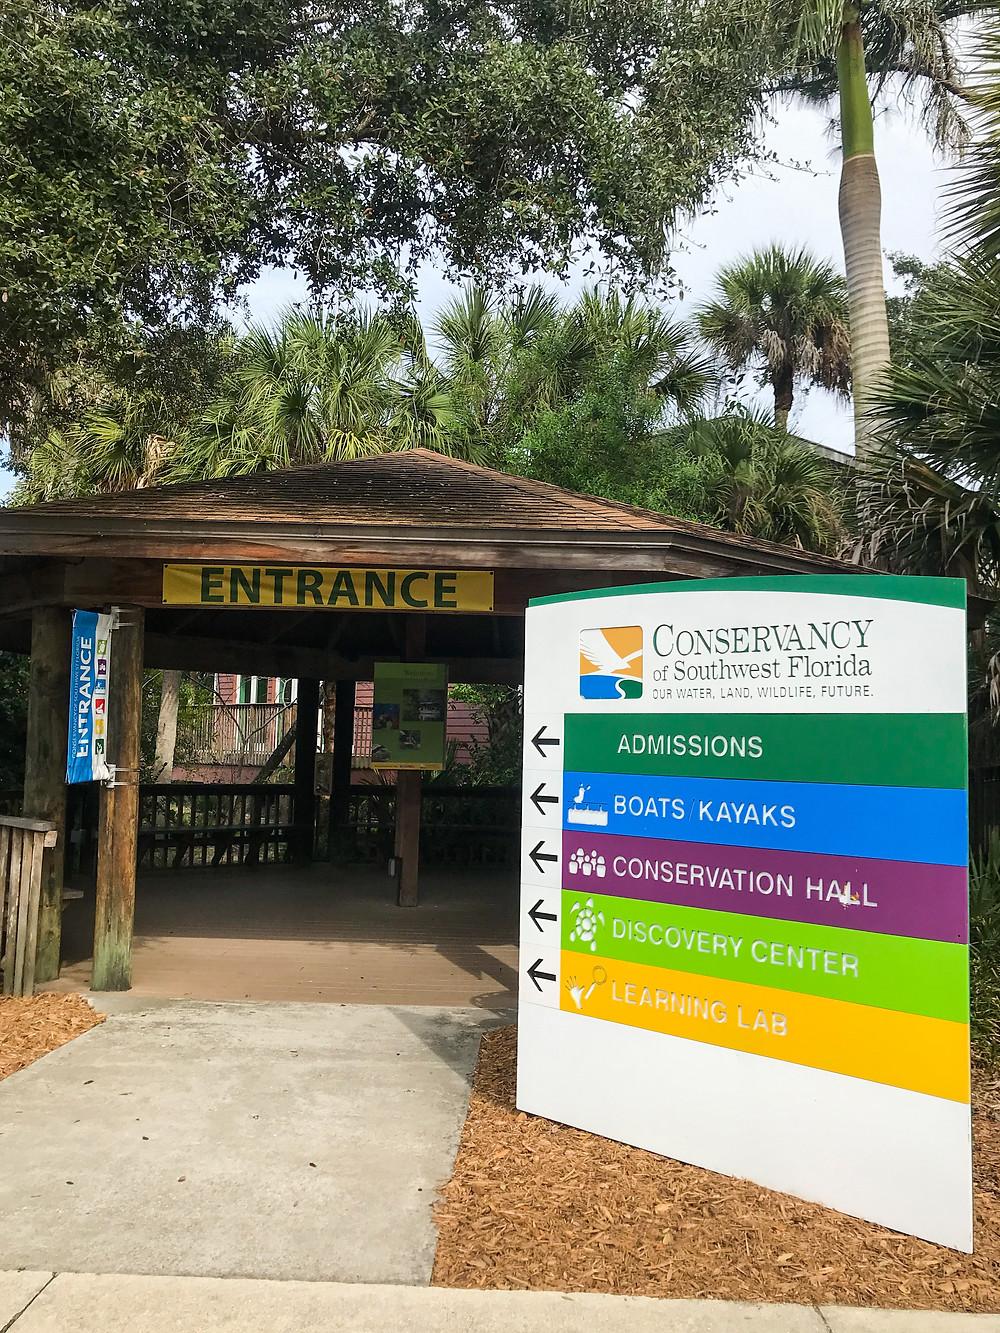 conservancy of southwest Florida in Naples, florida